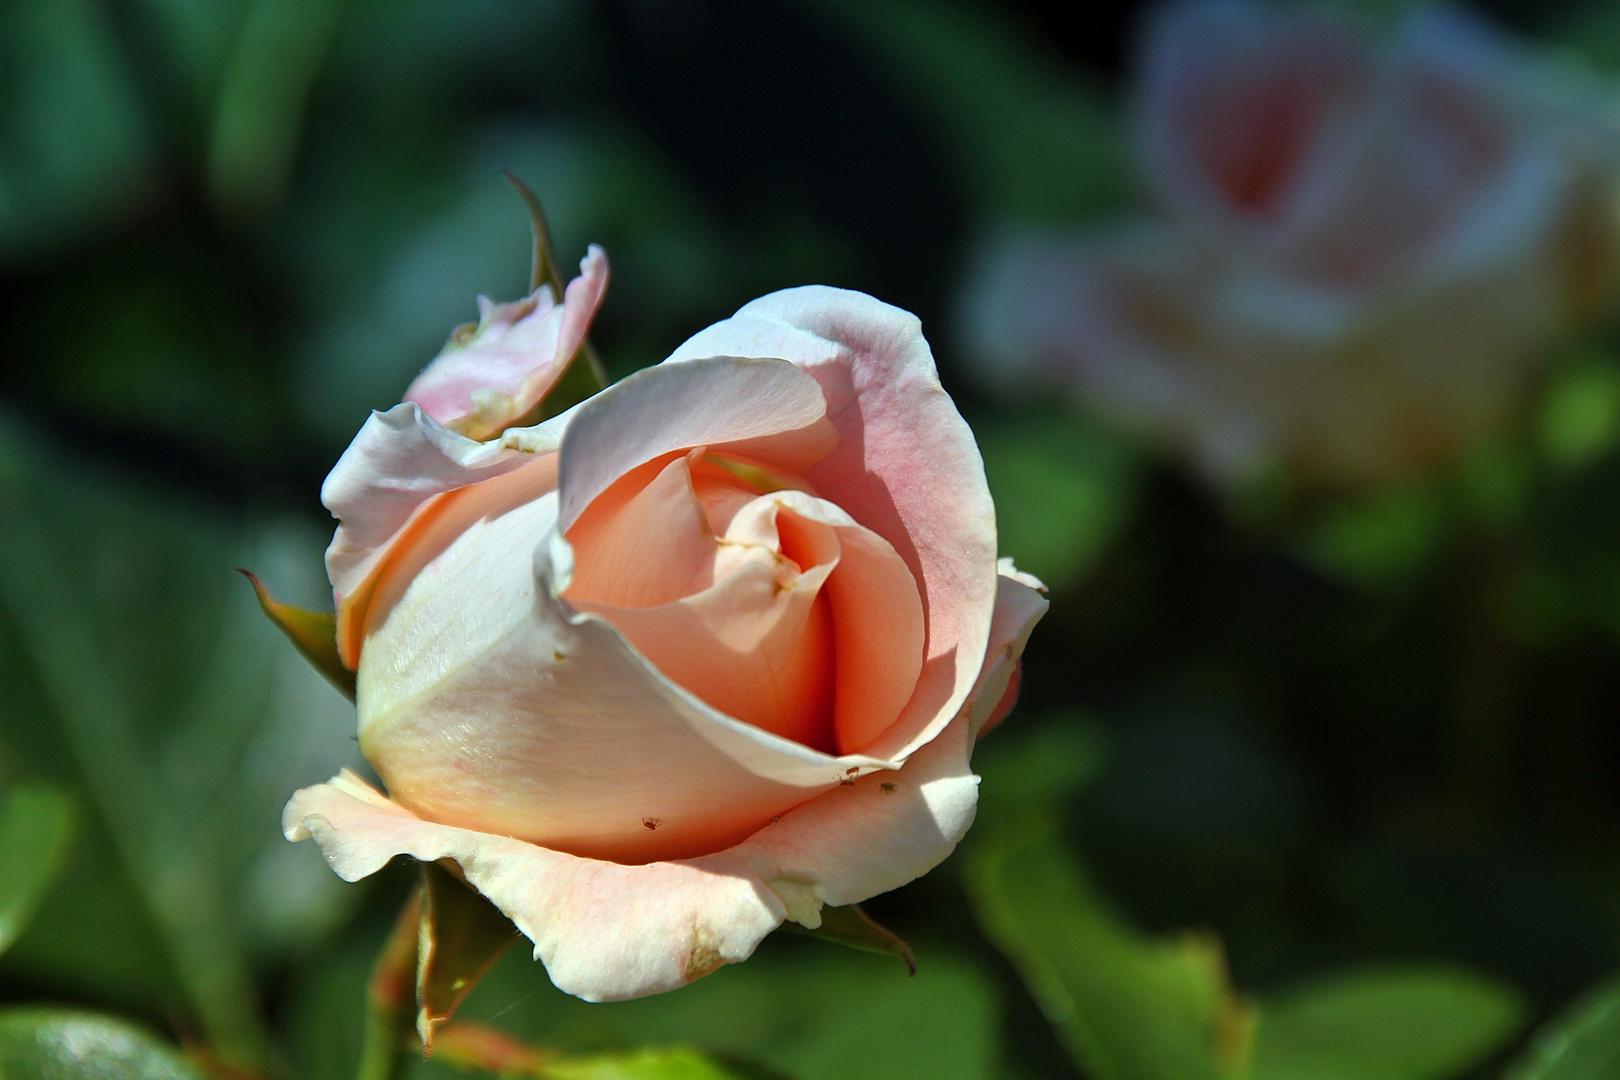 geburtstagsw nsche foto bild pflanzen pilze flechten bl ten kleinpflanzen rosen. Black Bedroom Furniture Sets. Home Design Ideas